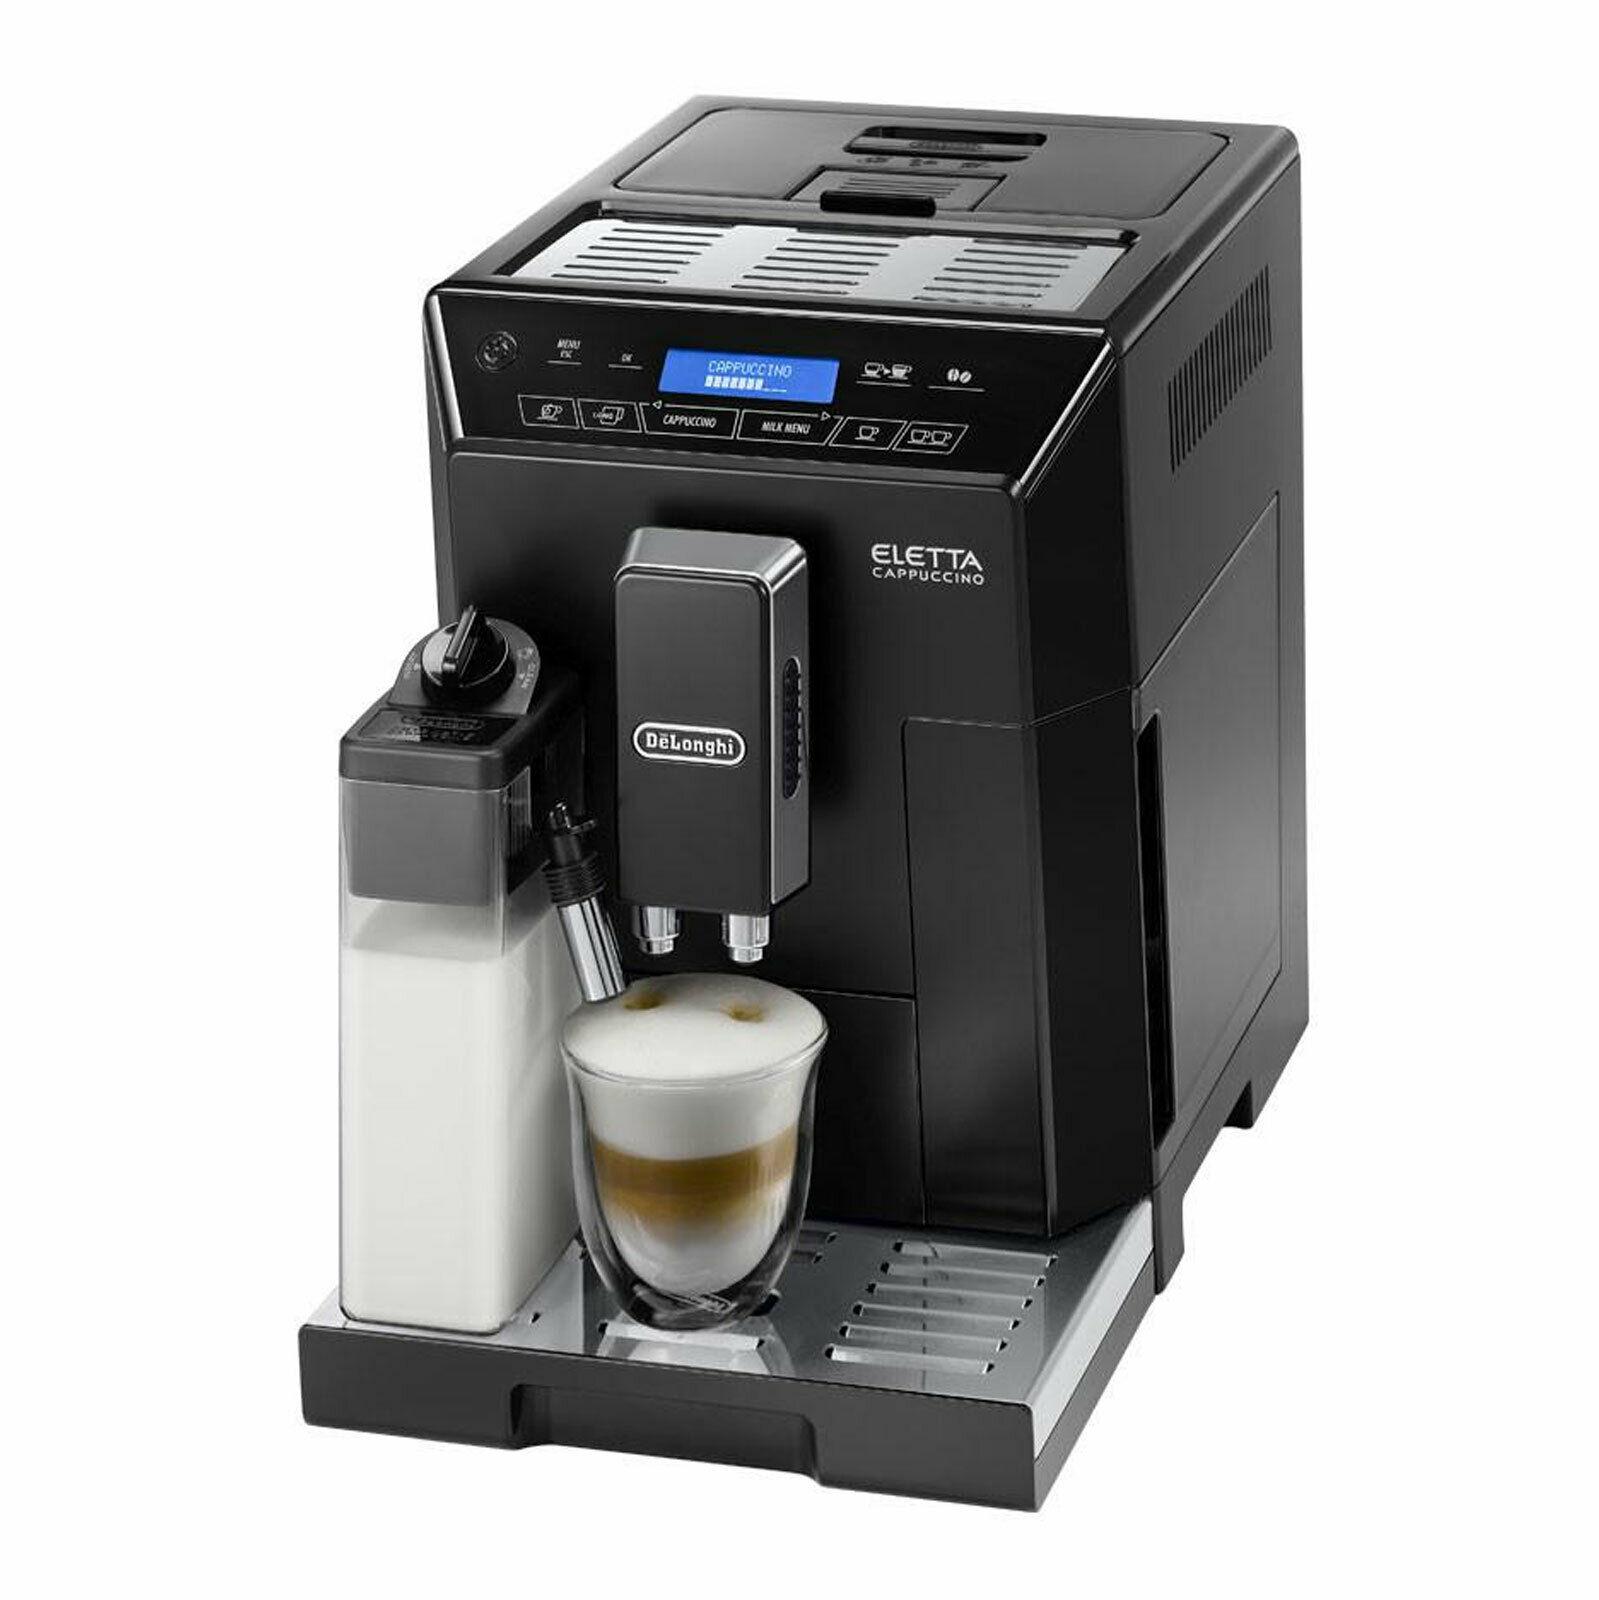 Bild zu DeLonghi ECAM 44.660.B Eletta Kaffeevollautomat für 399,90€ (Vergleich: 447,95€)